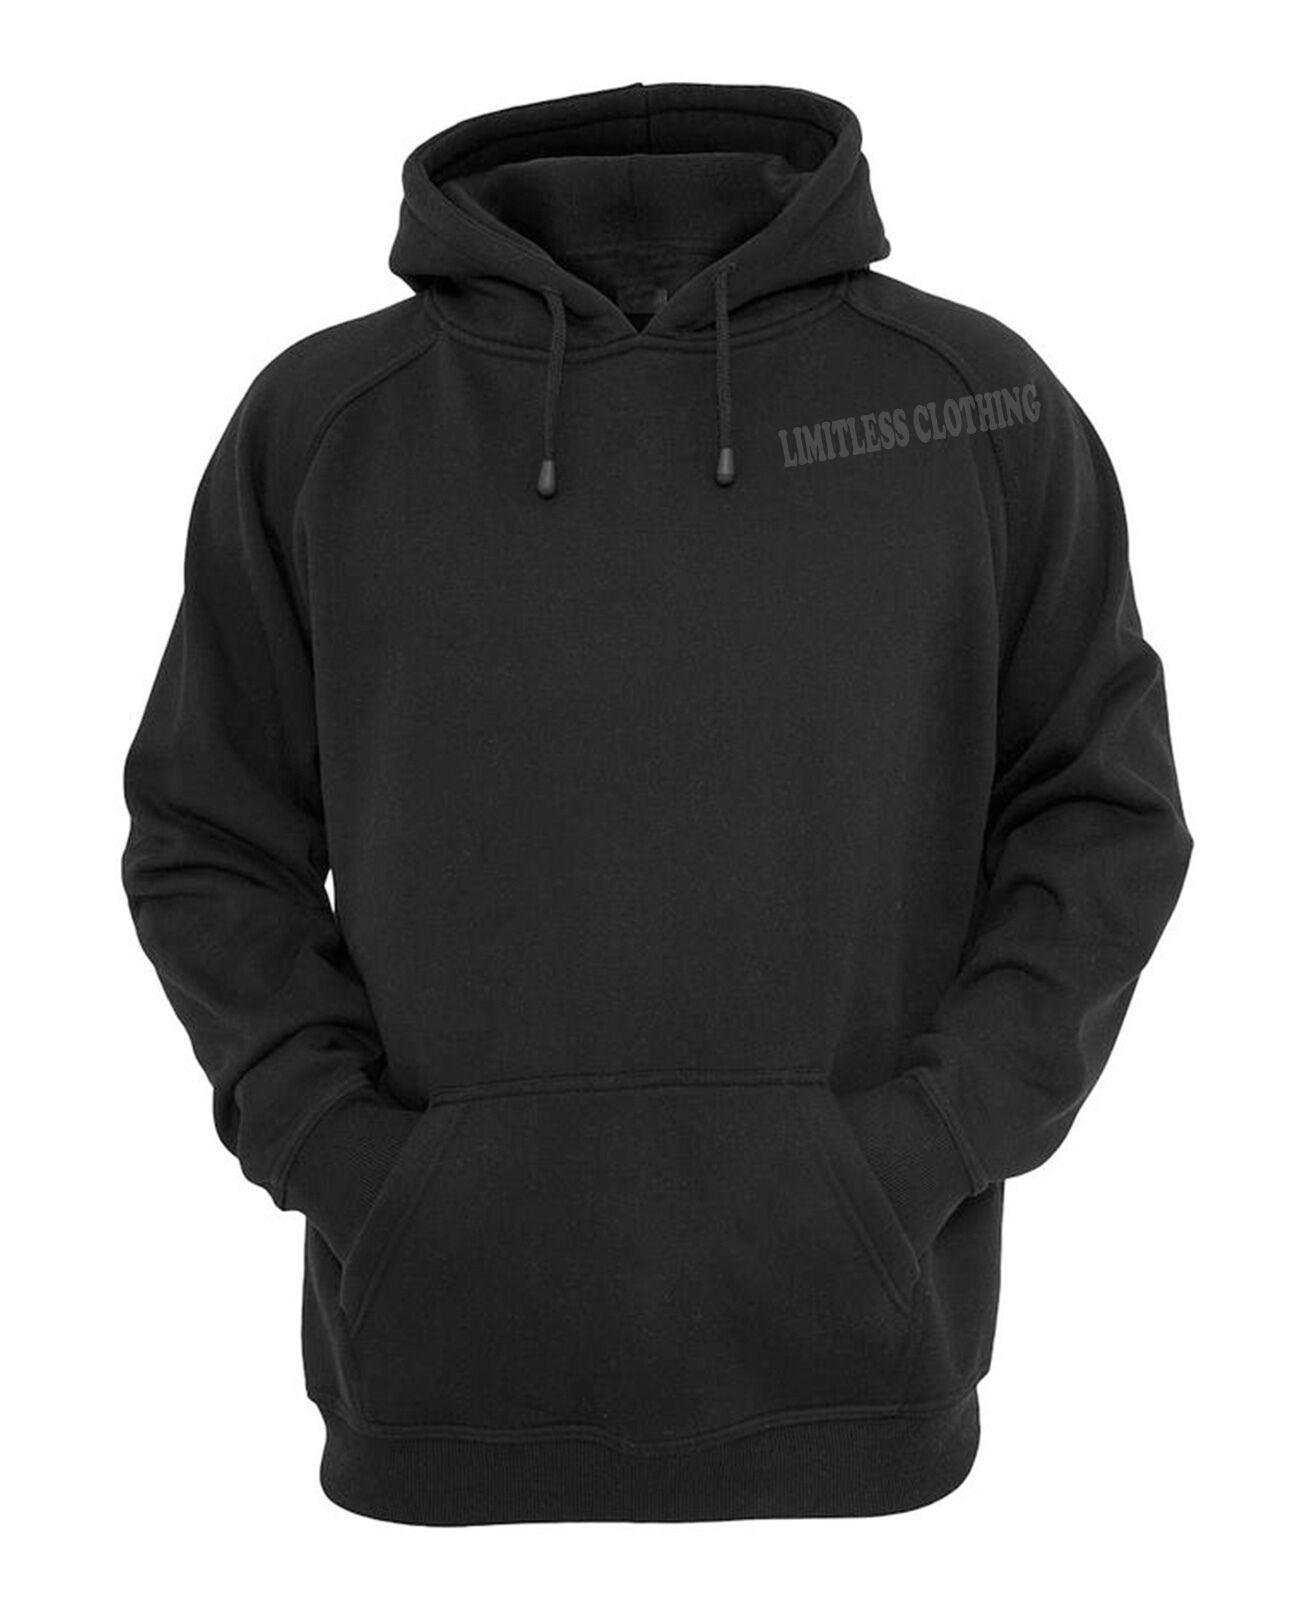 BNWT Mens Adidas Originals Lightweight Black Green Hoodie XS S M Hoody